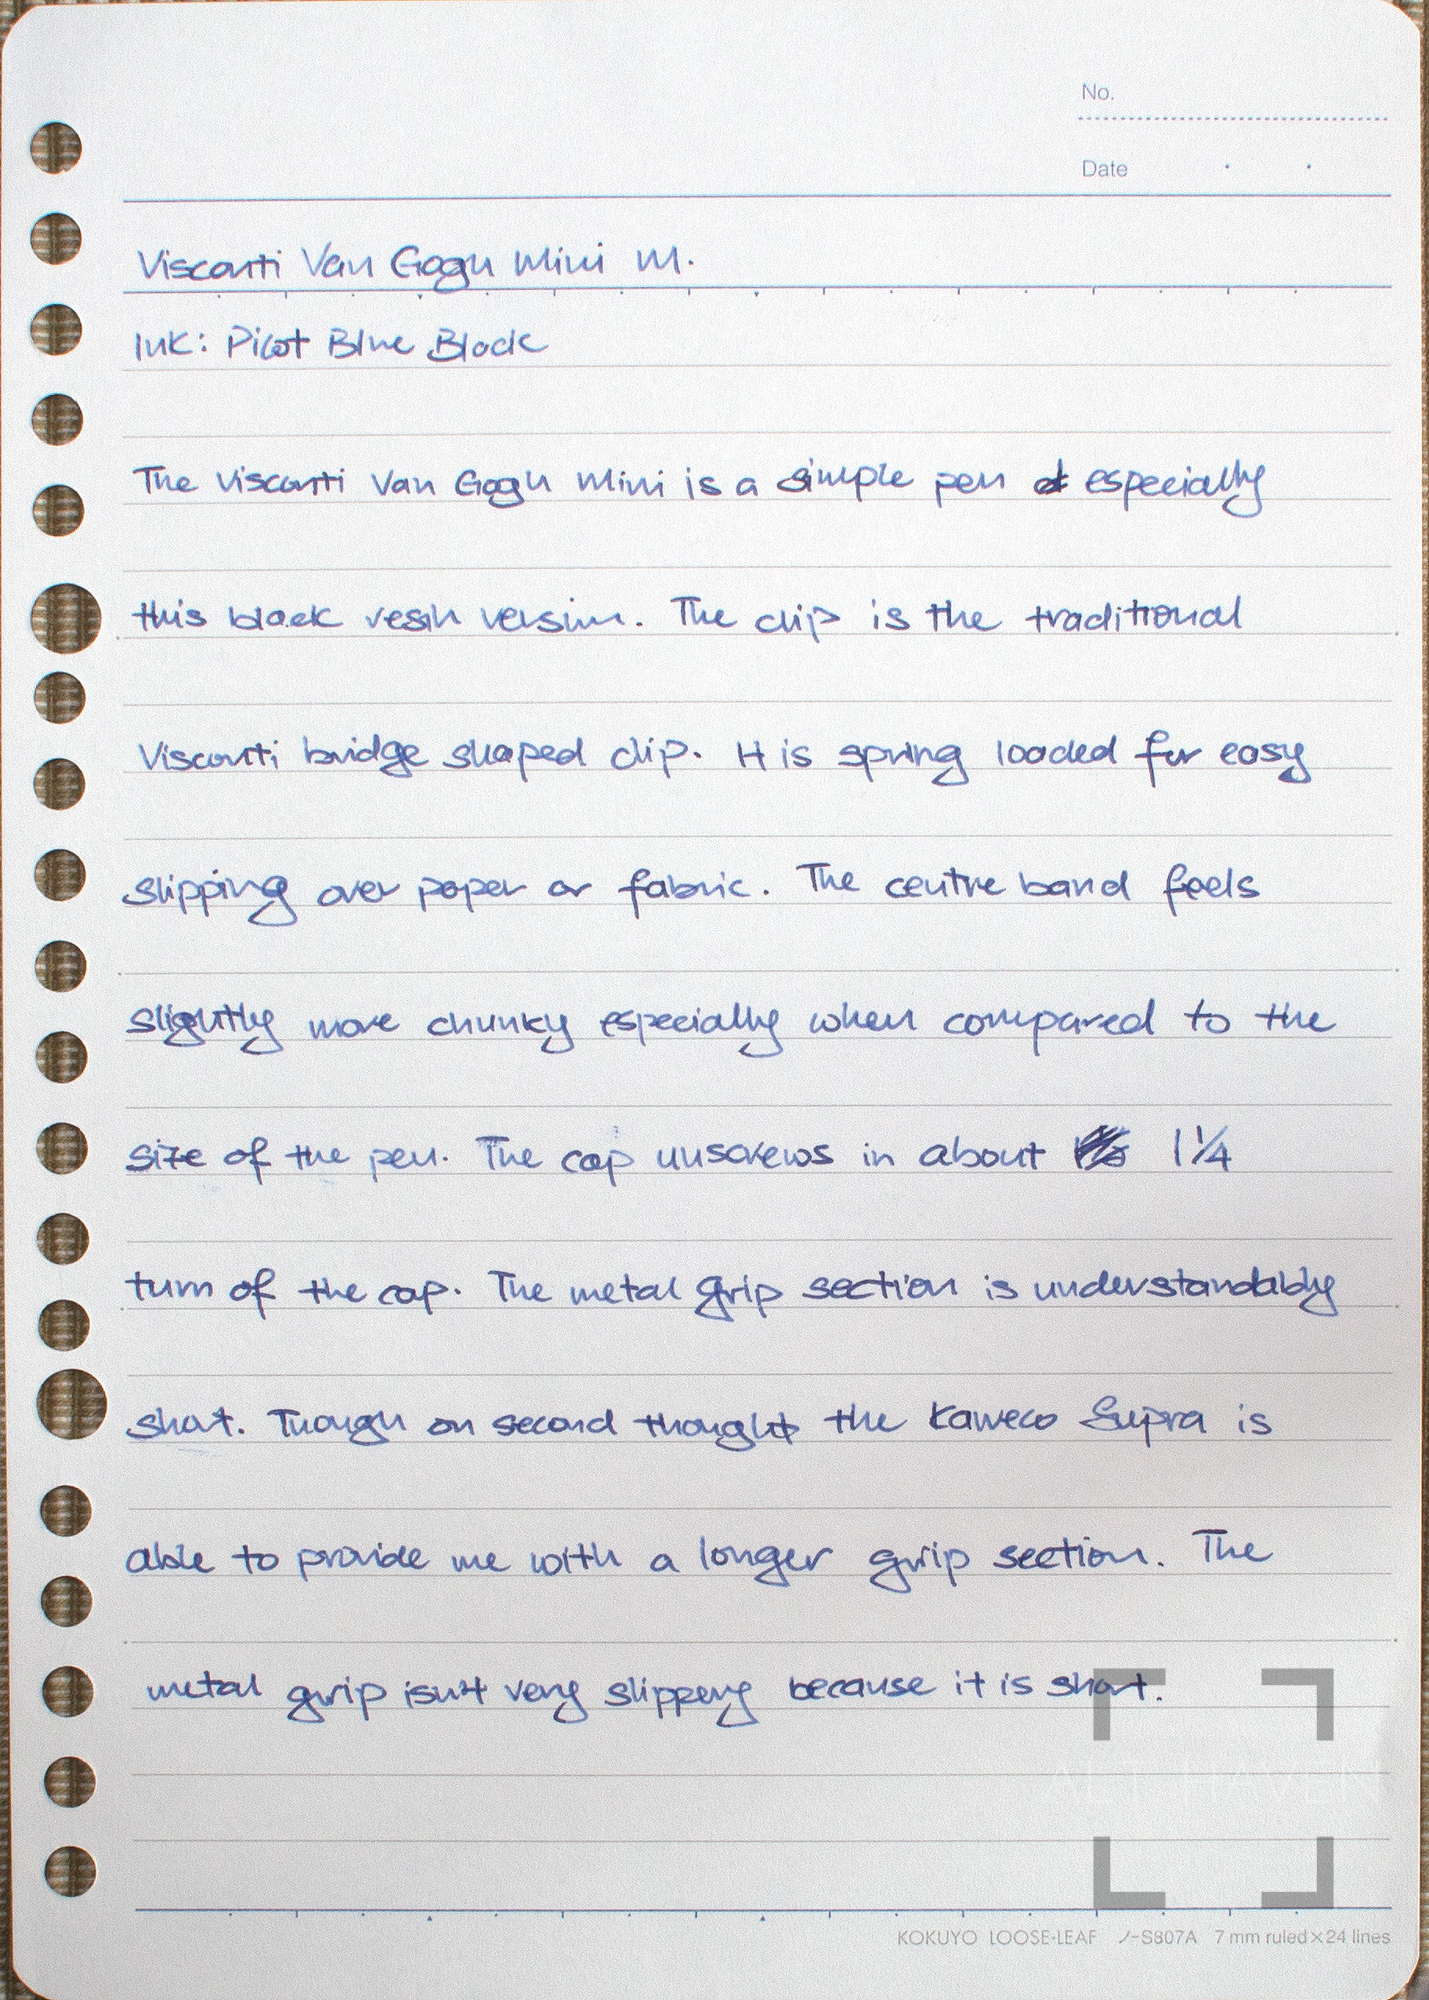 VIsconti Van Gogh Mini Written Review-2.jpg